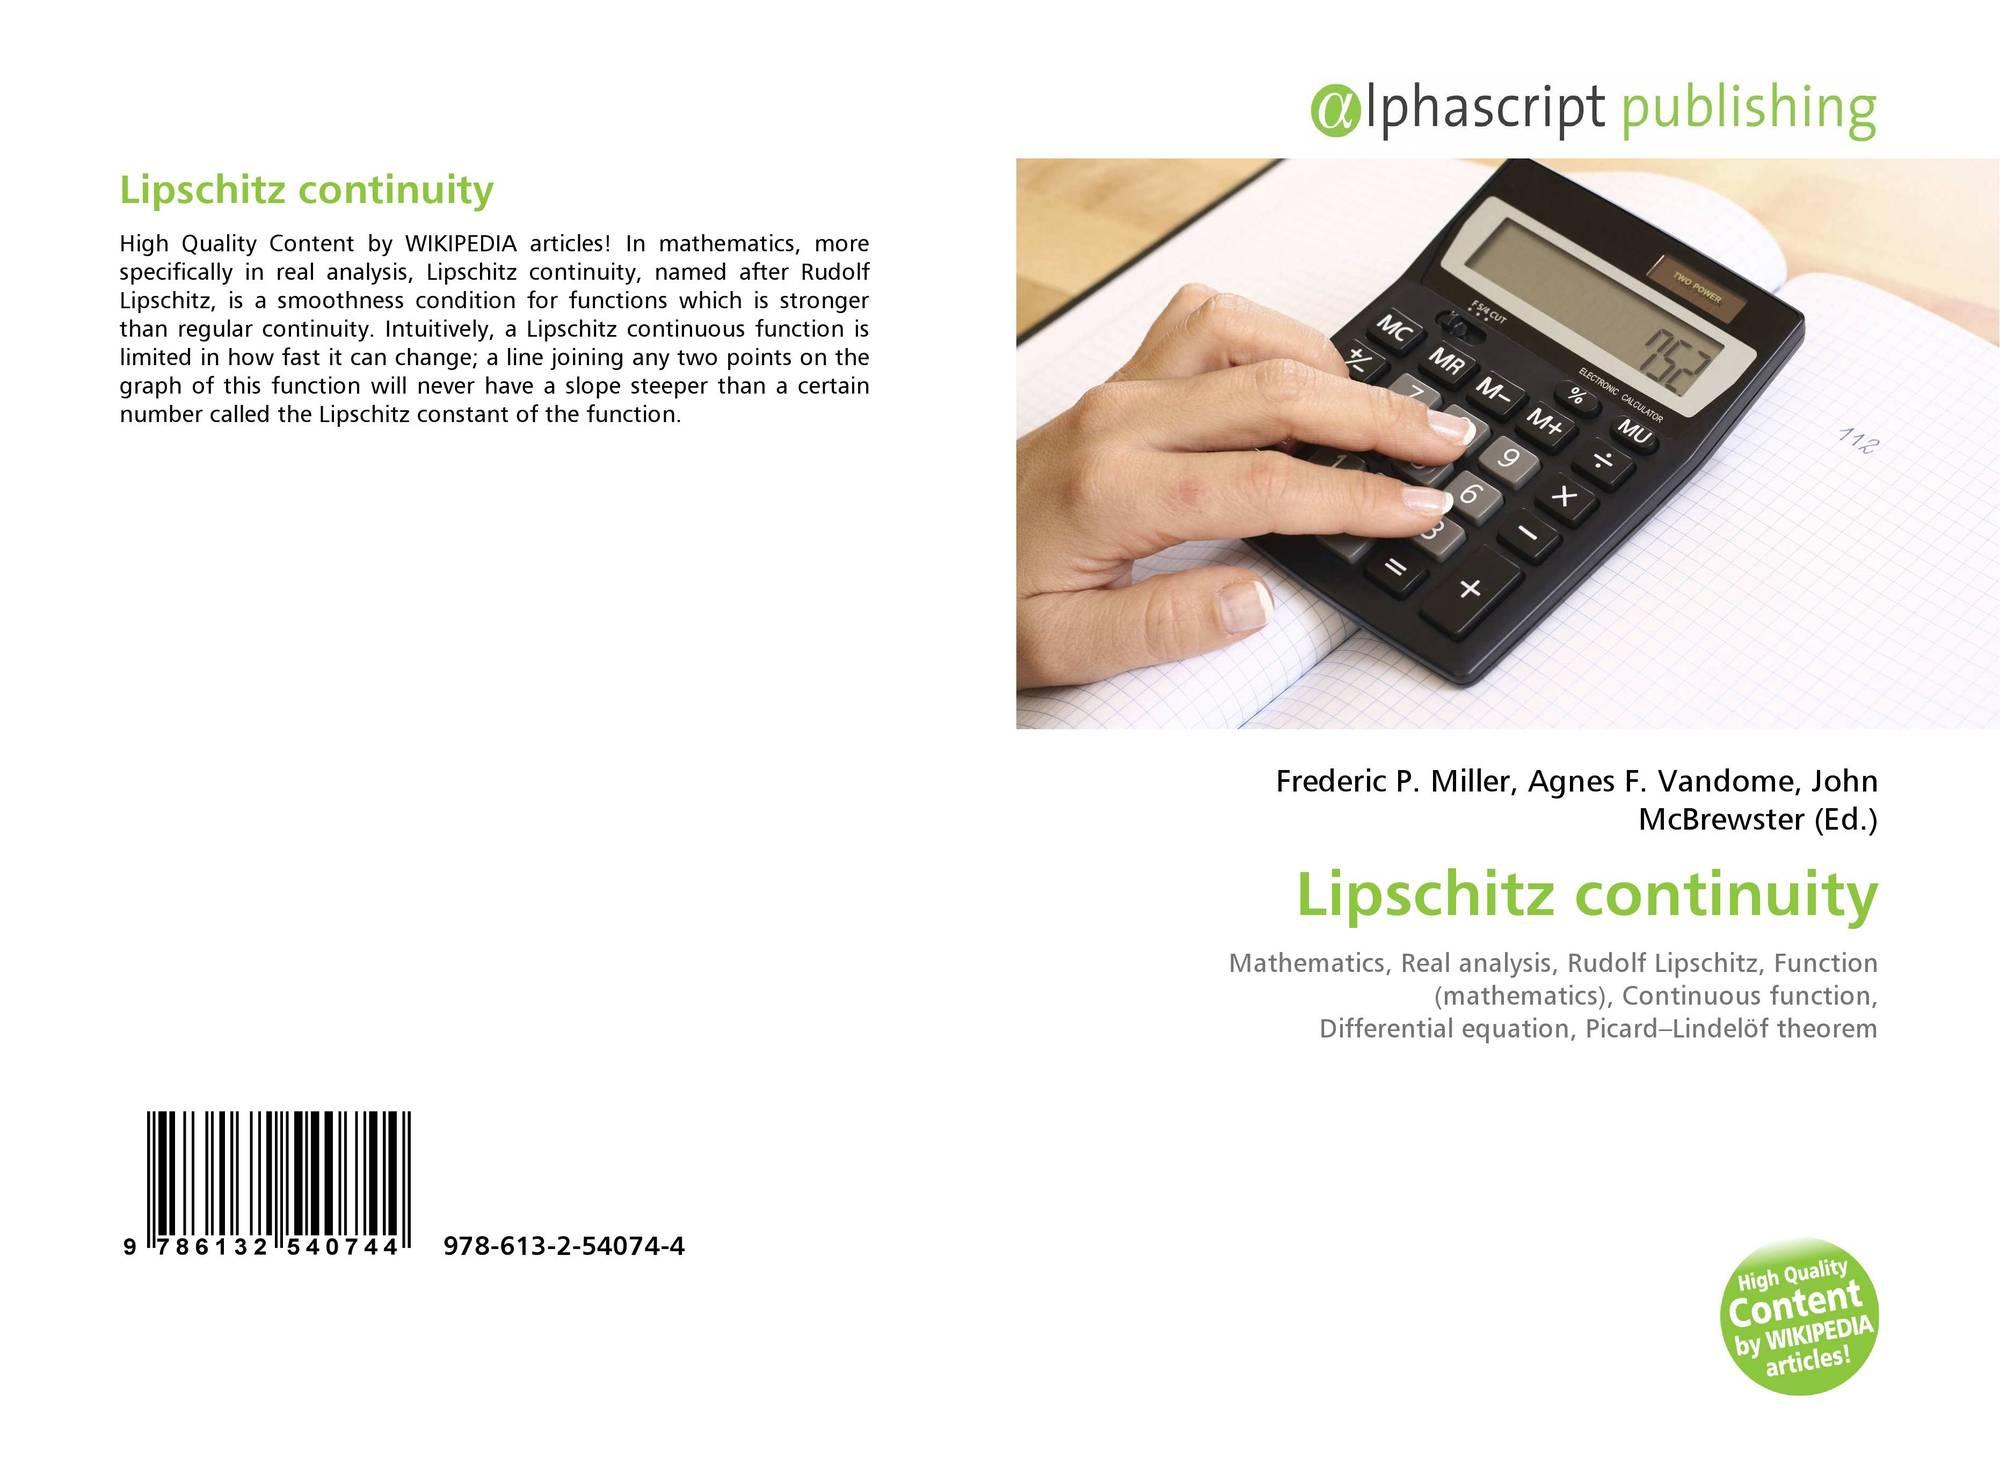 Lipschitz continuity, 978-613-2-54074-4, 6132540741 ,9786132540744